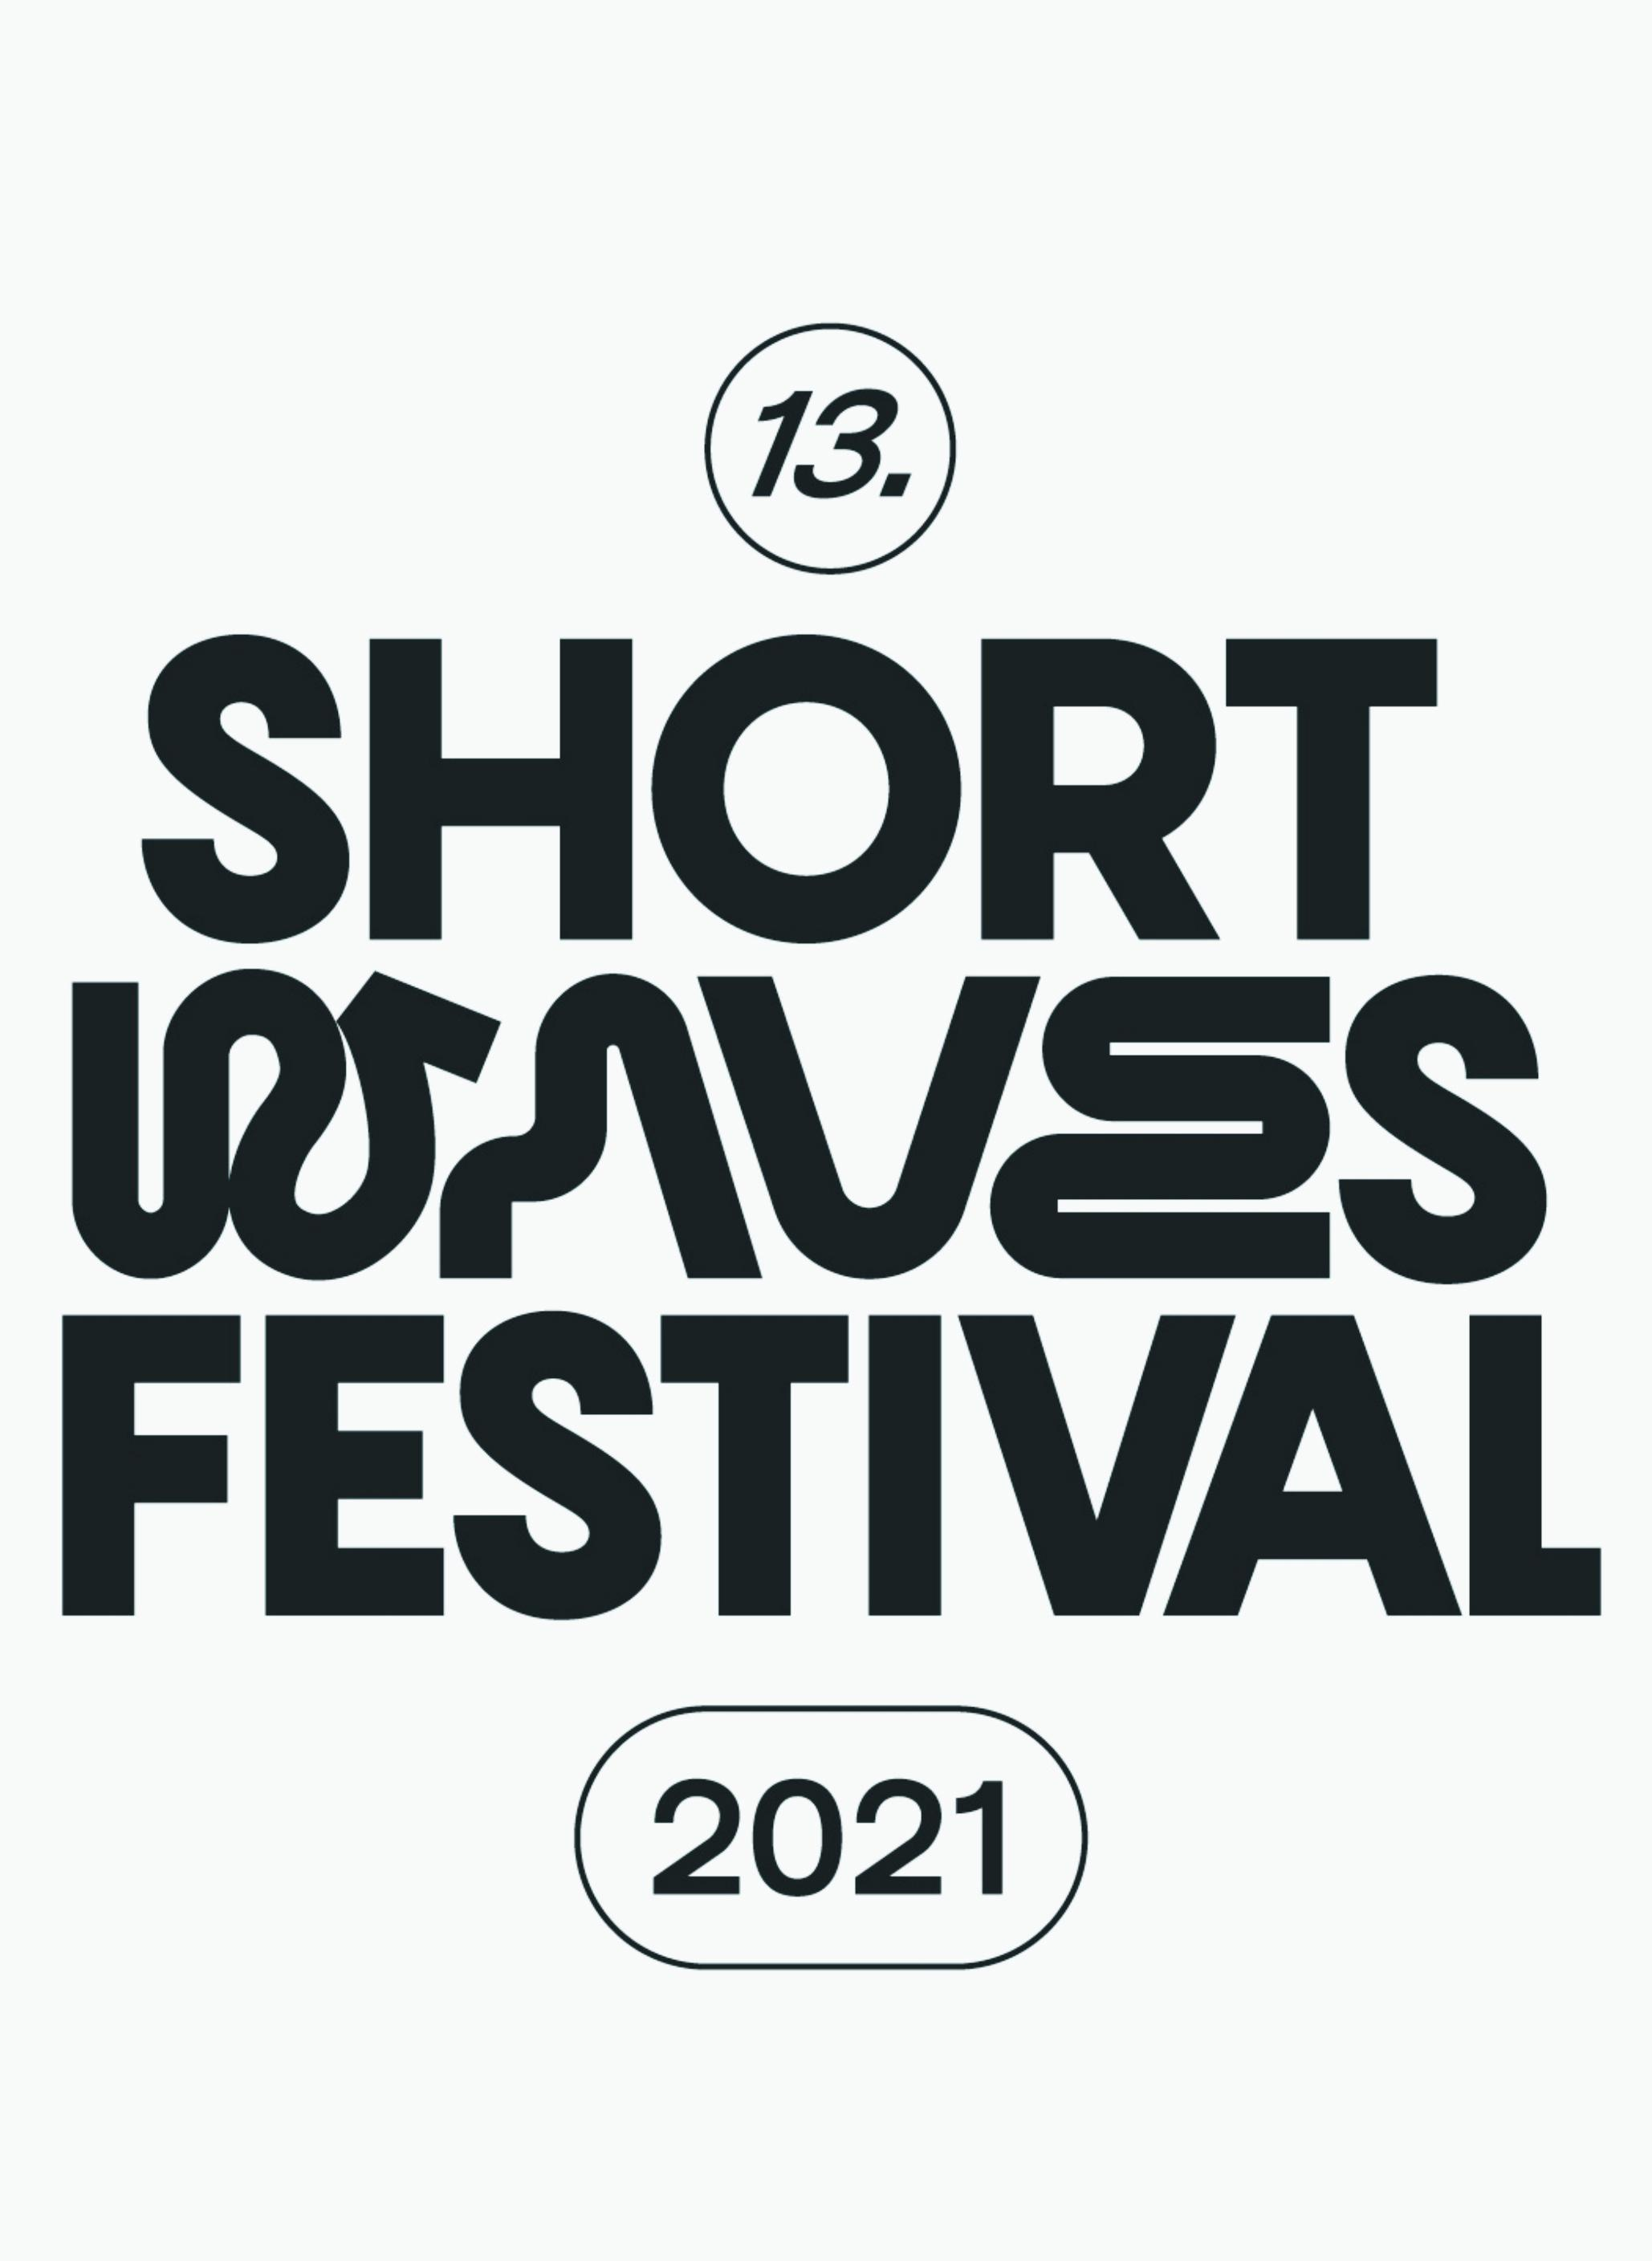 Short Waves Festival 2021 - International Competition IV: System crash / Awaria systemu